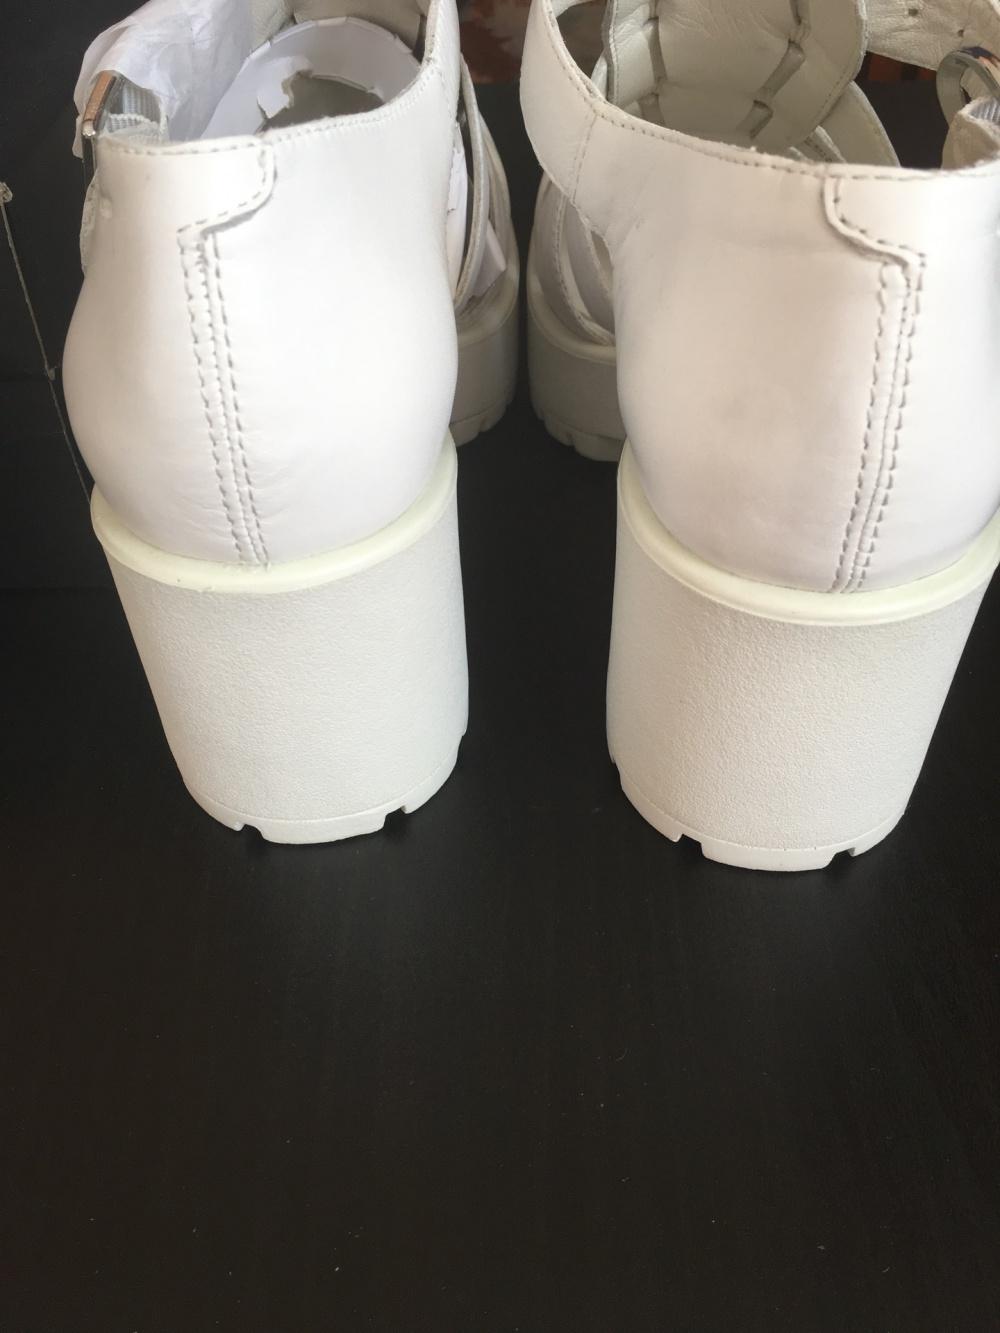 Босоножки Vagabond Shoemakers , 39 размер